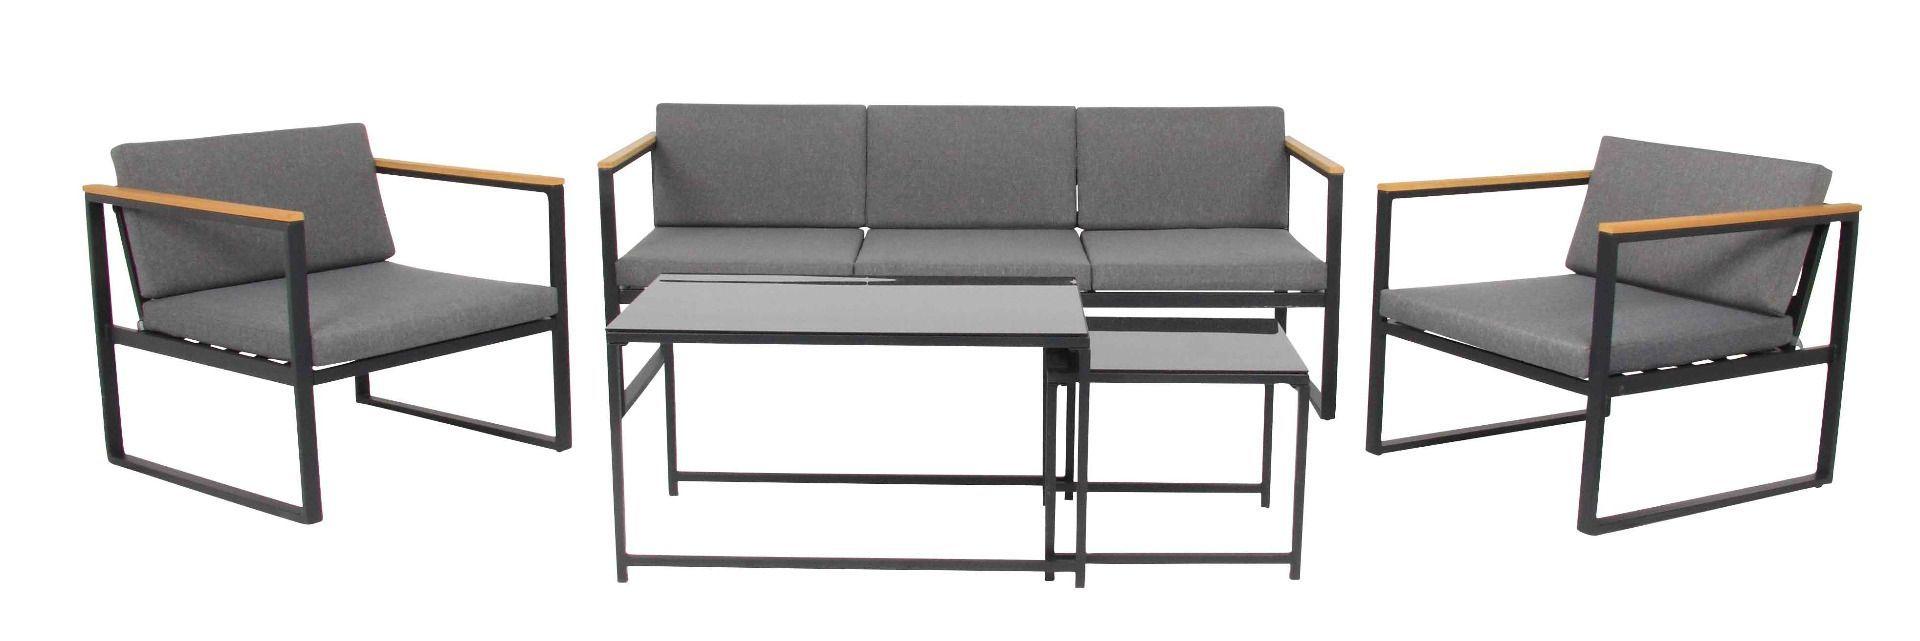 Space Lounge Set 5 Teilig Stahl Verzinkt Pulverbeschichtet Lounge Mobel Mobel Lounge